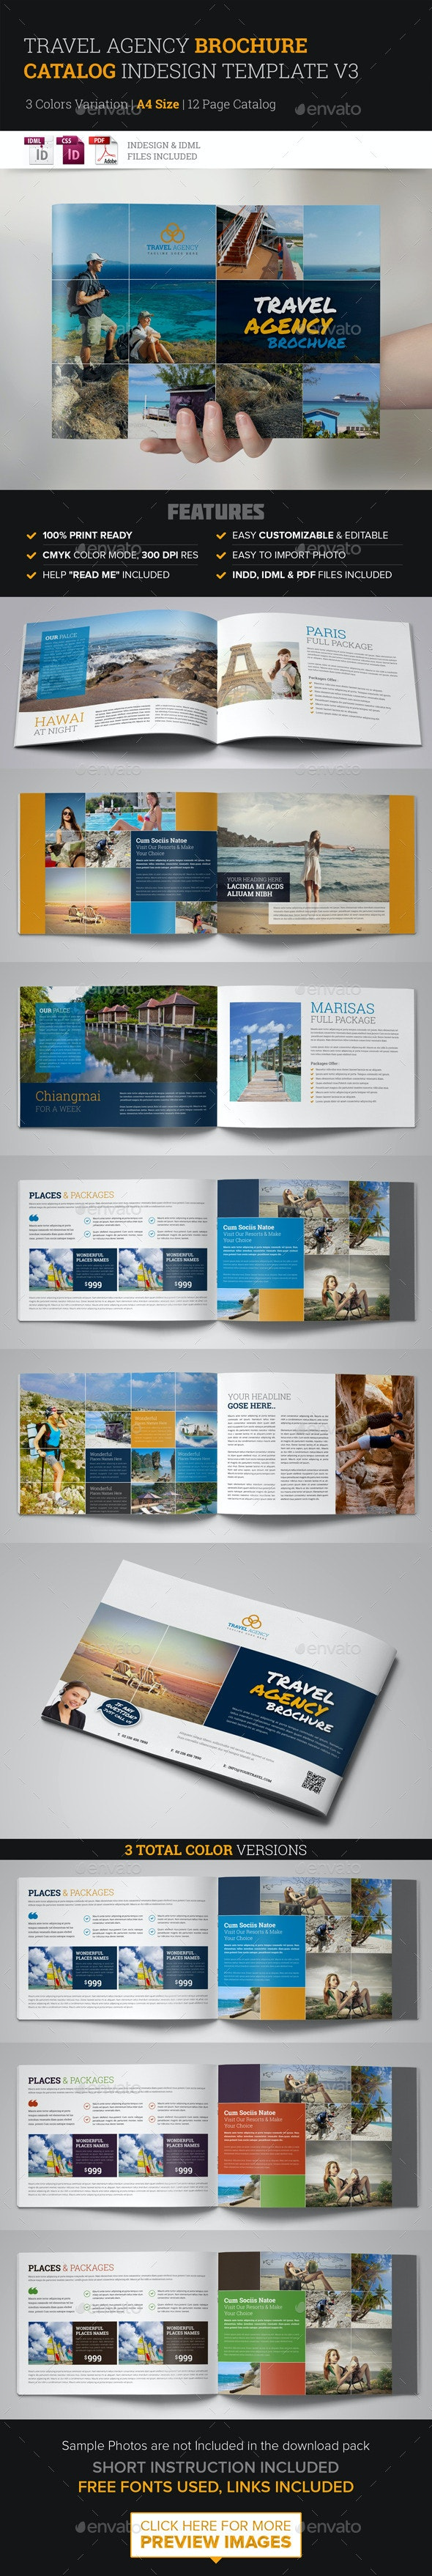 Travel Agency Brochure Catalog InDesign Template 3 - Corporate Brochures